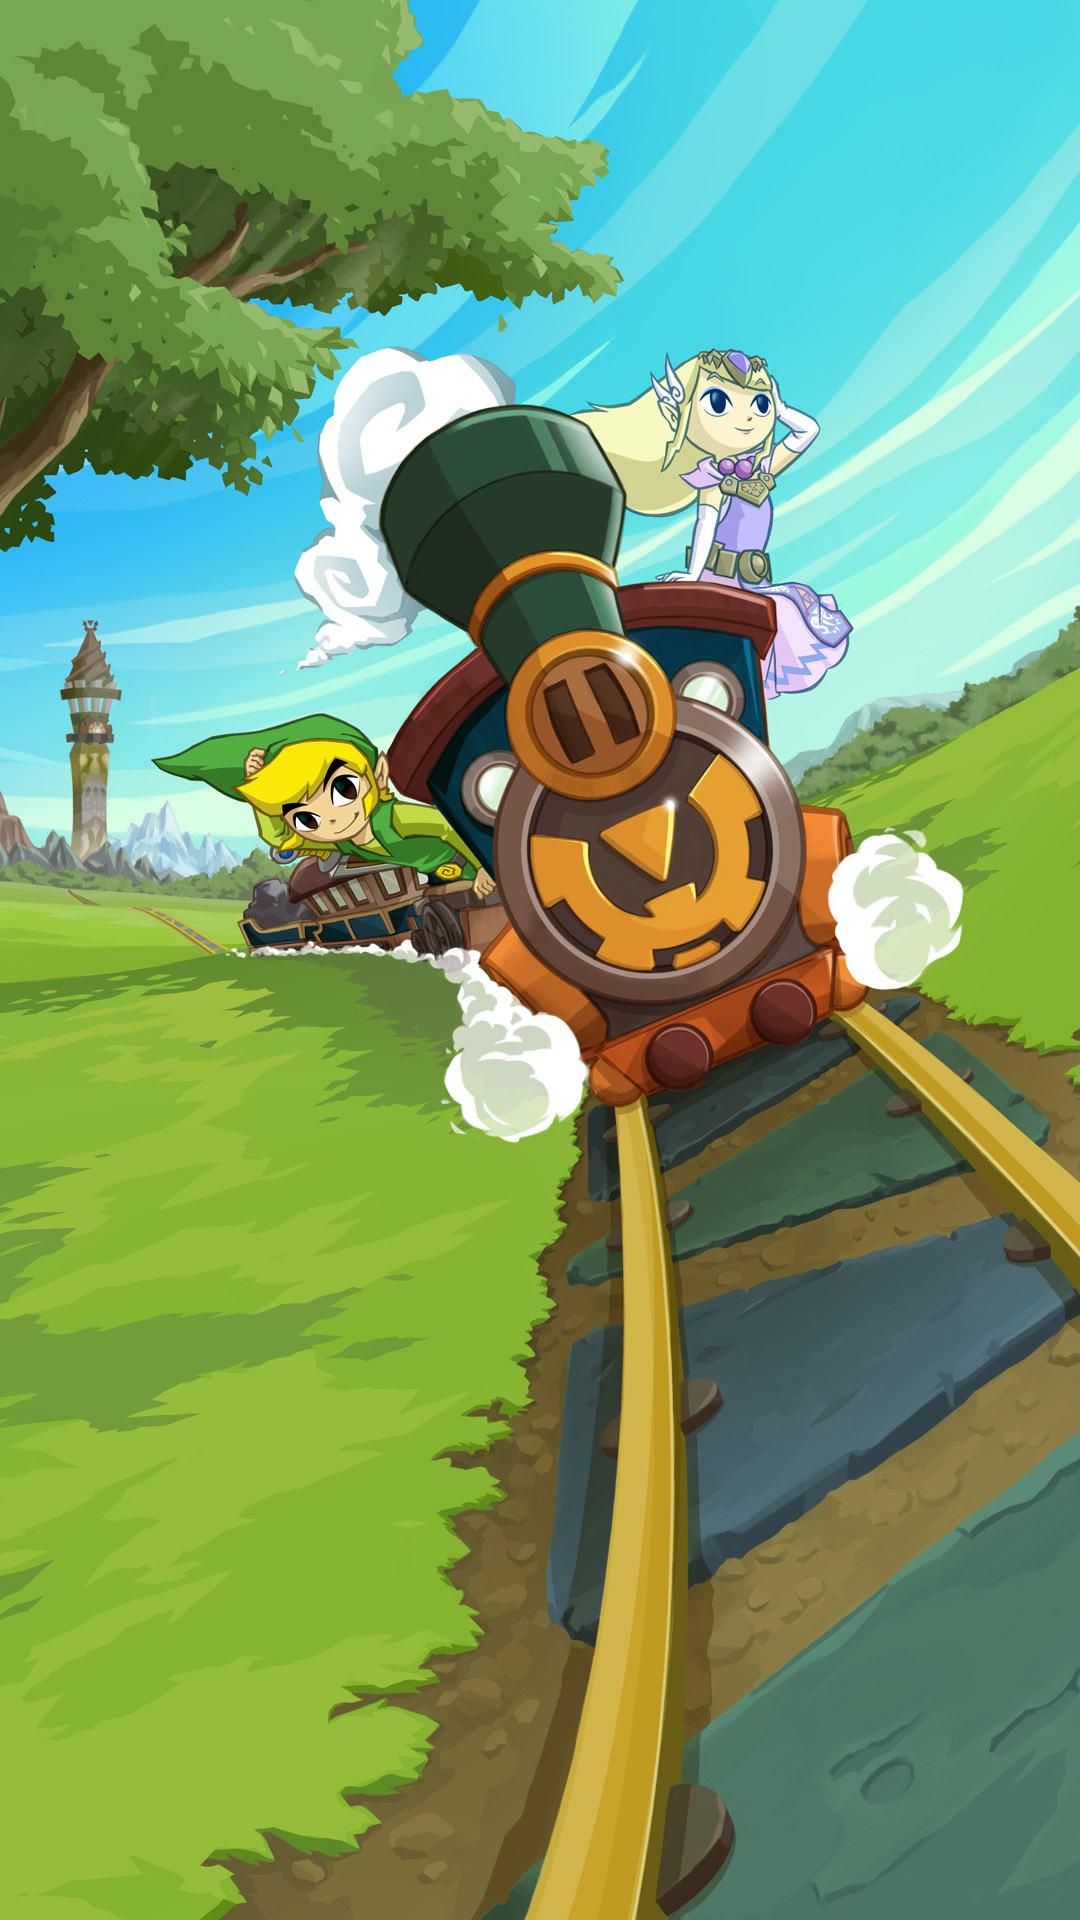 Free Download Legend Of Zelda Ocarina Of Time Mobile Phone